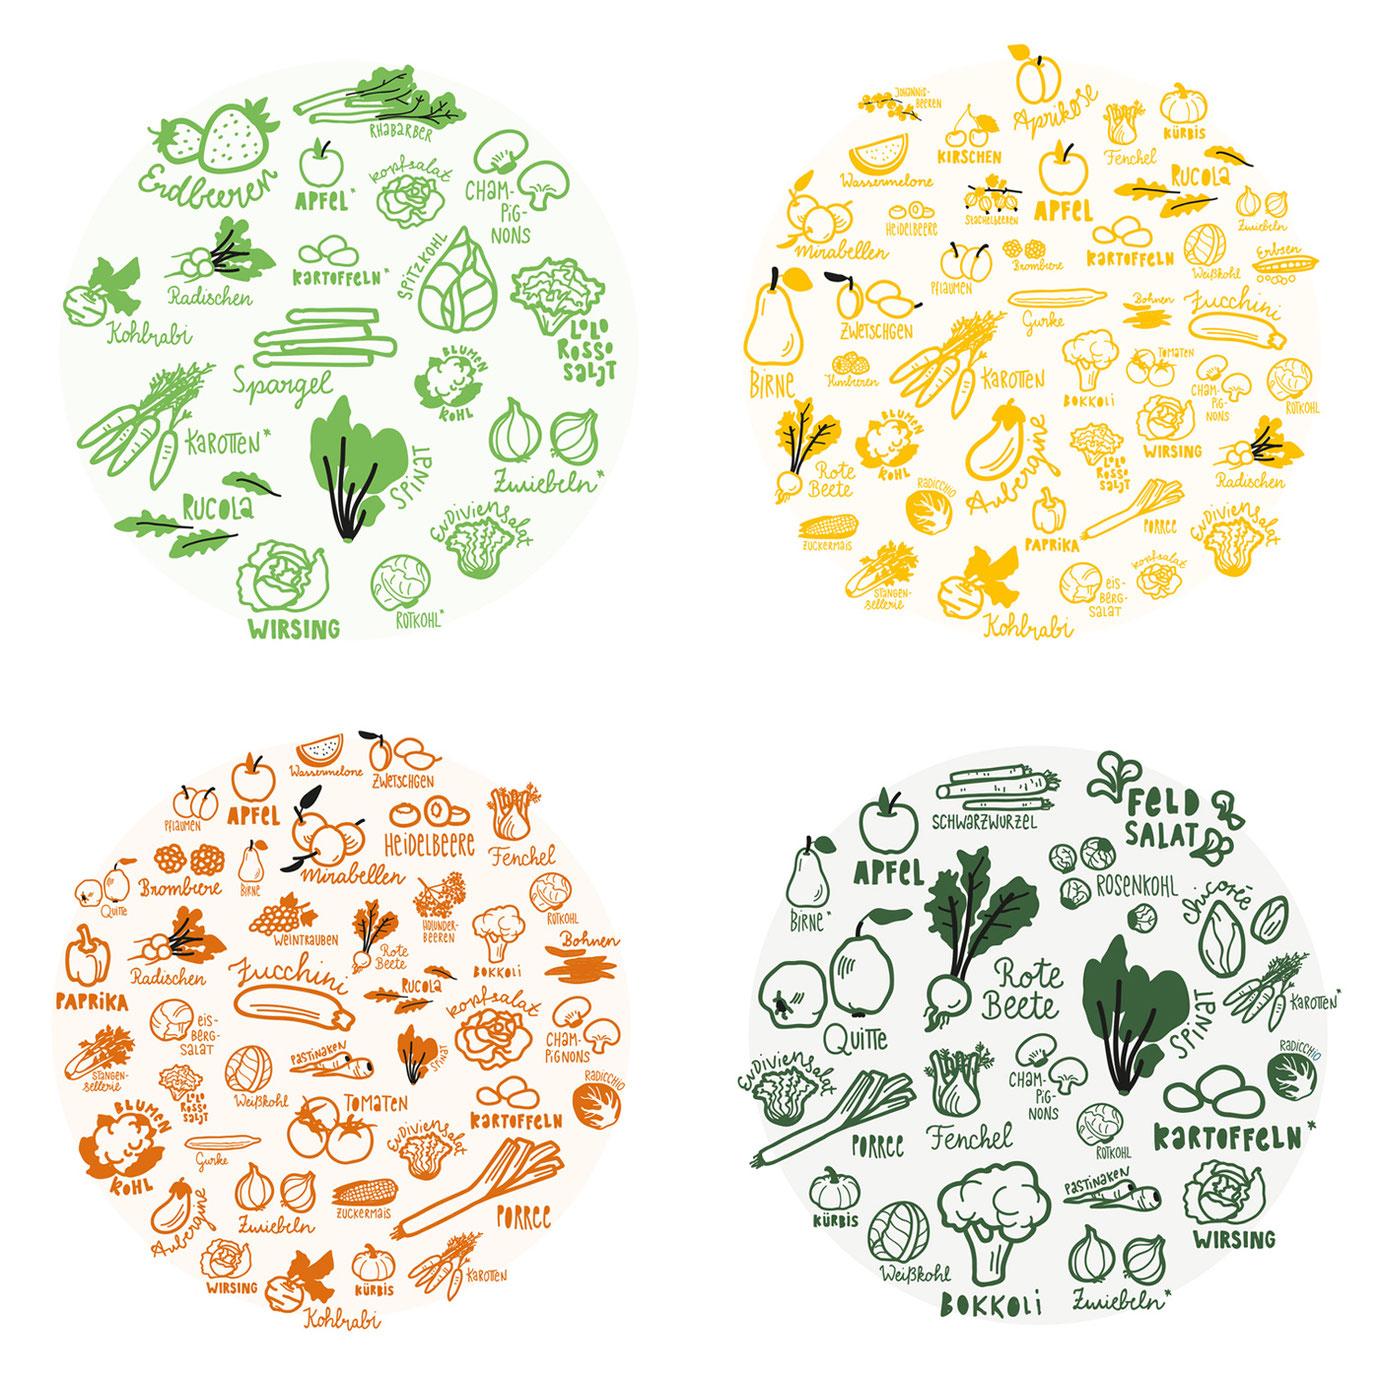 Details der Doodle Illustration zu Obst und Gemüse Foodillustration Sketchnotes. Vectorillustration von Marina Schilling.